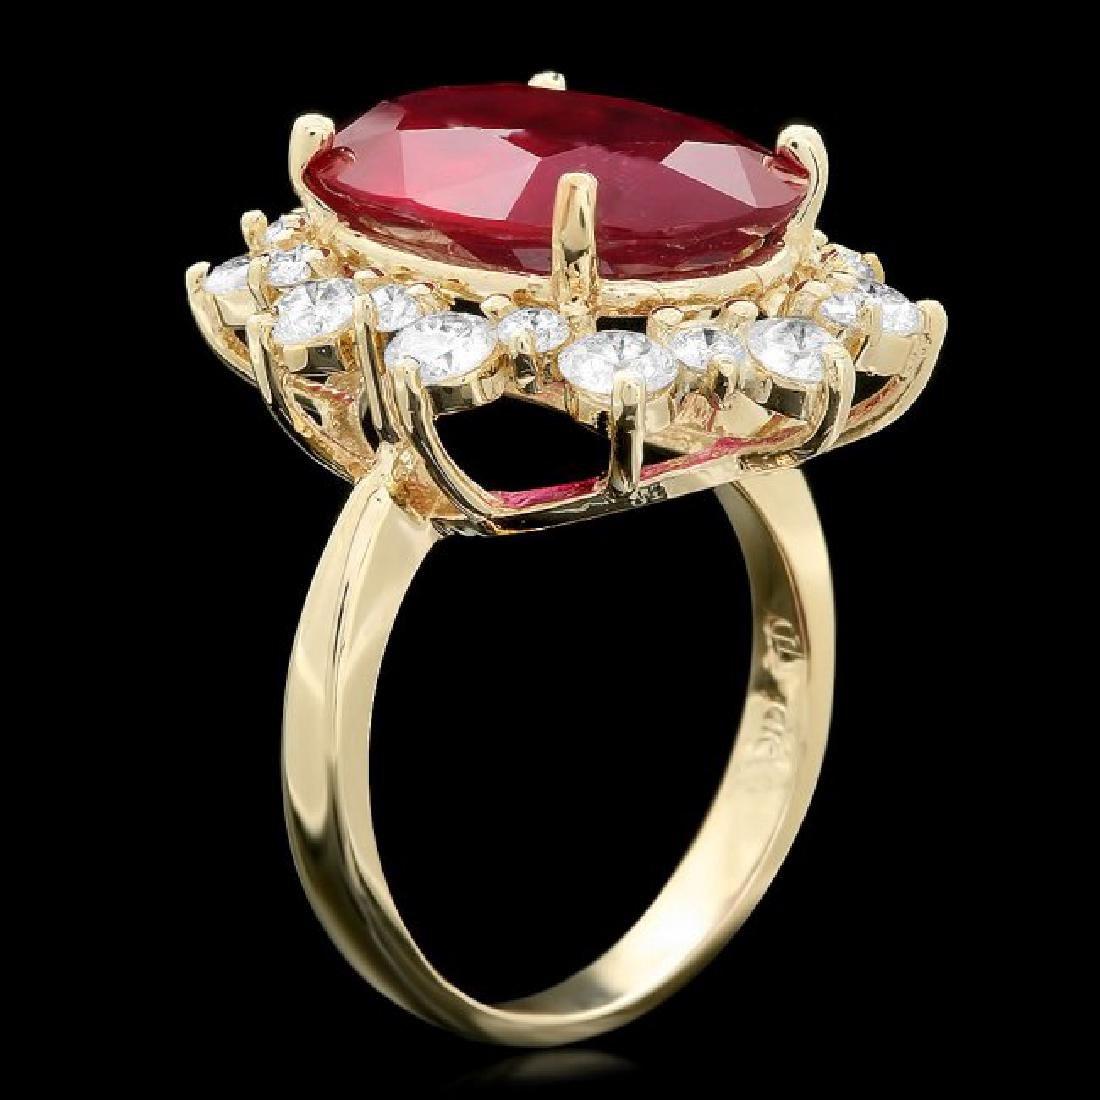 14k Yellow Gold 9.5ct Ruby 1.80ct Diamond Ring - 2